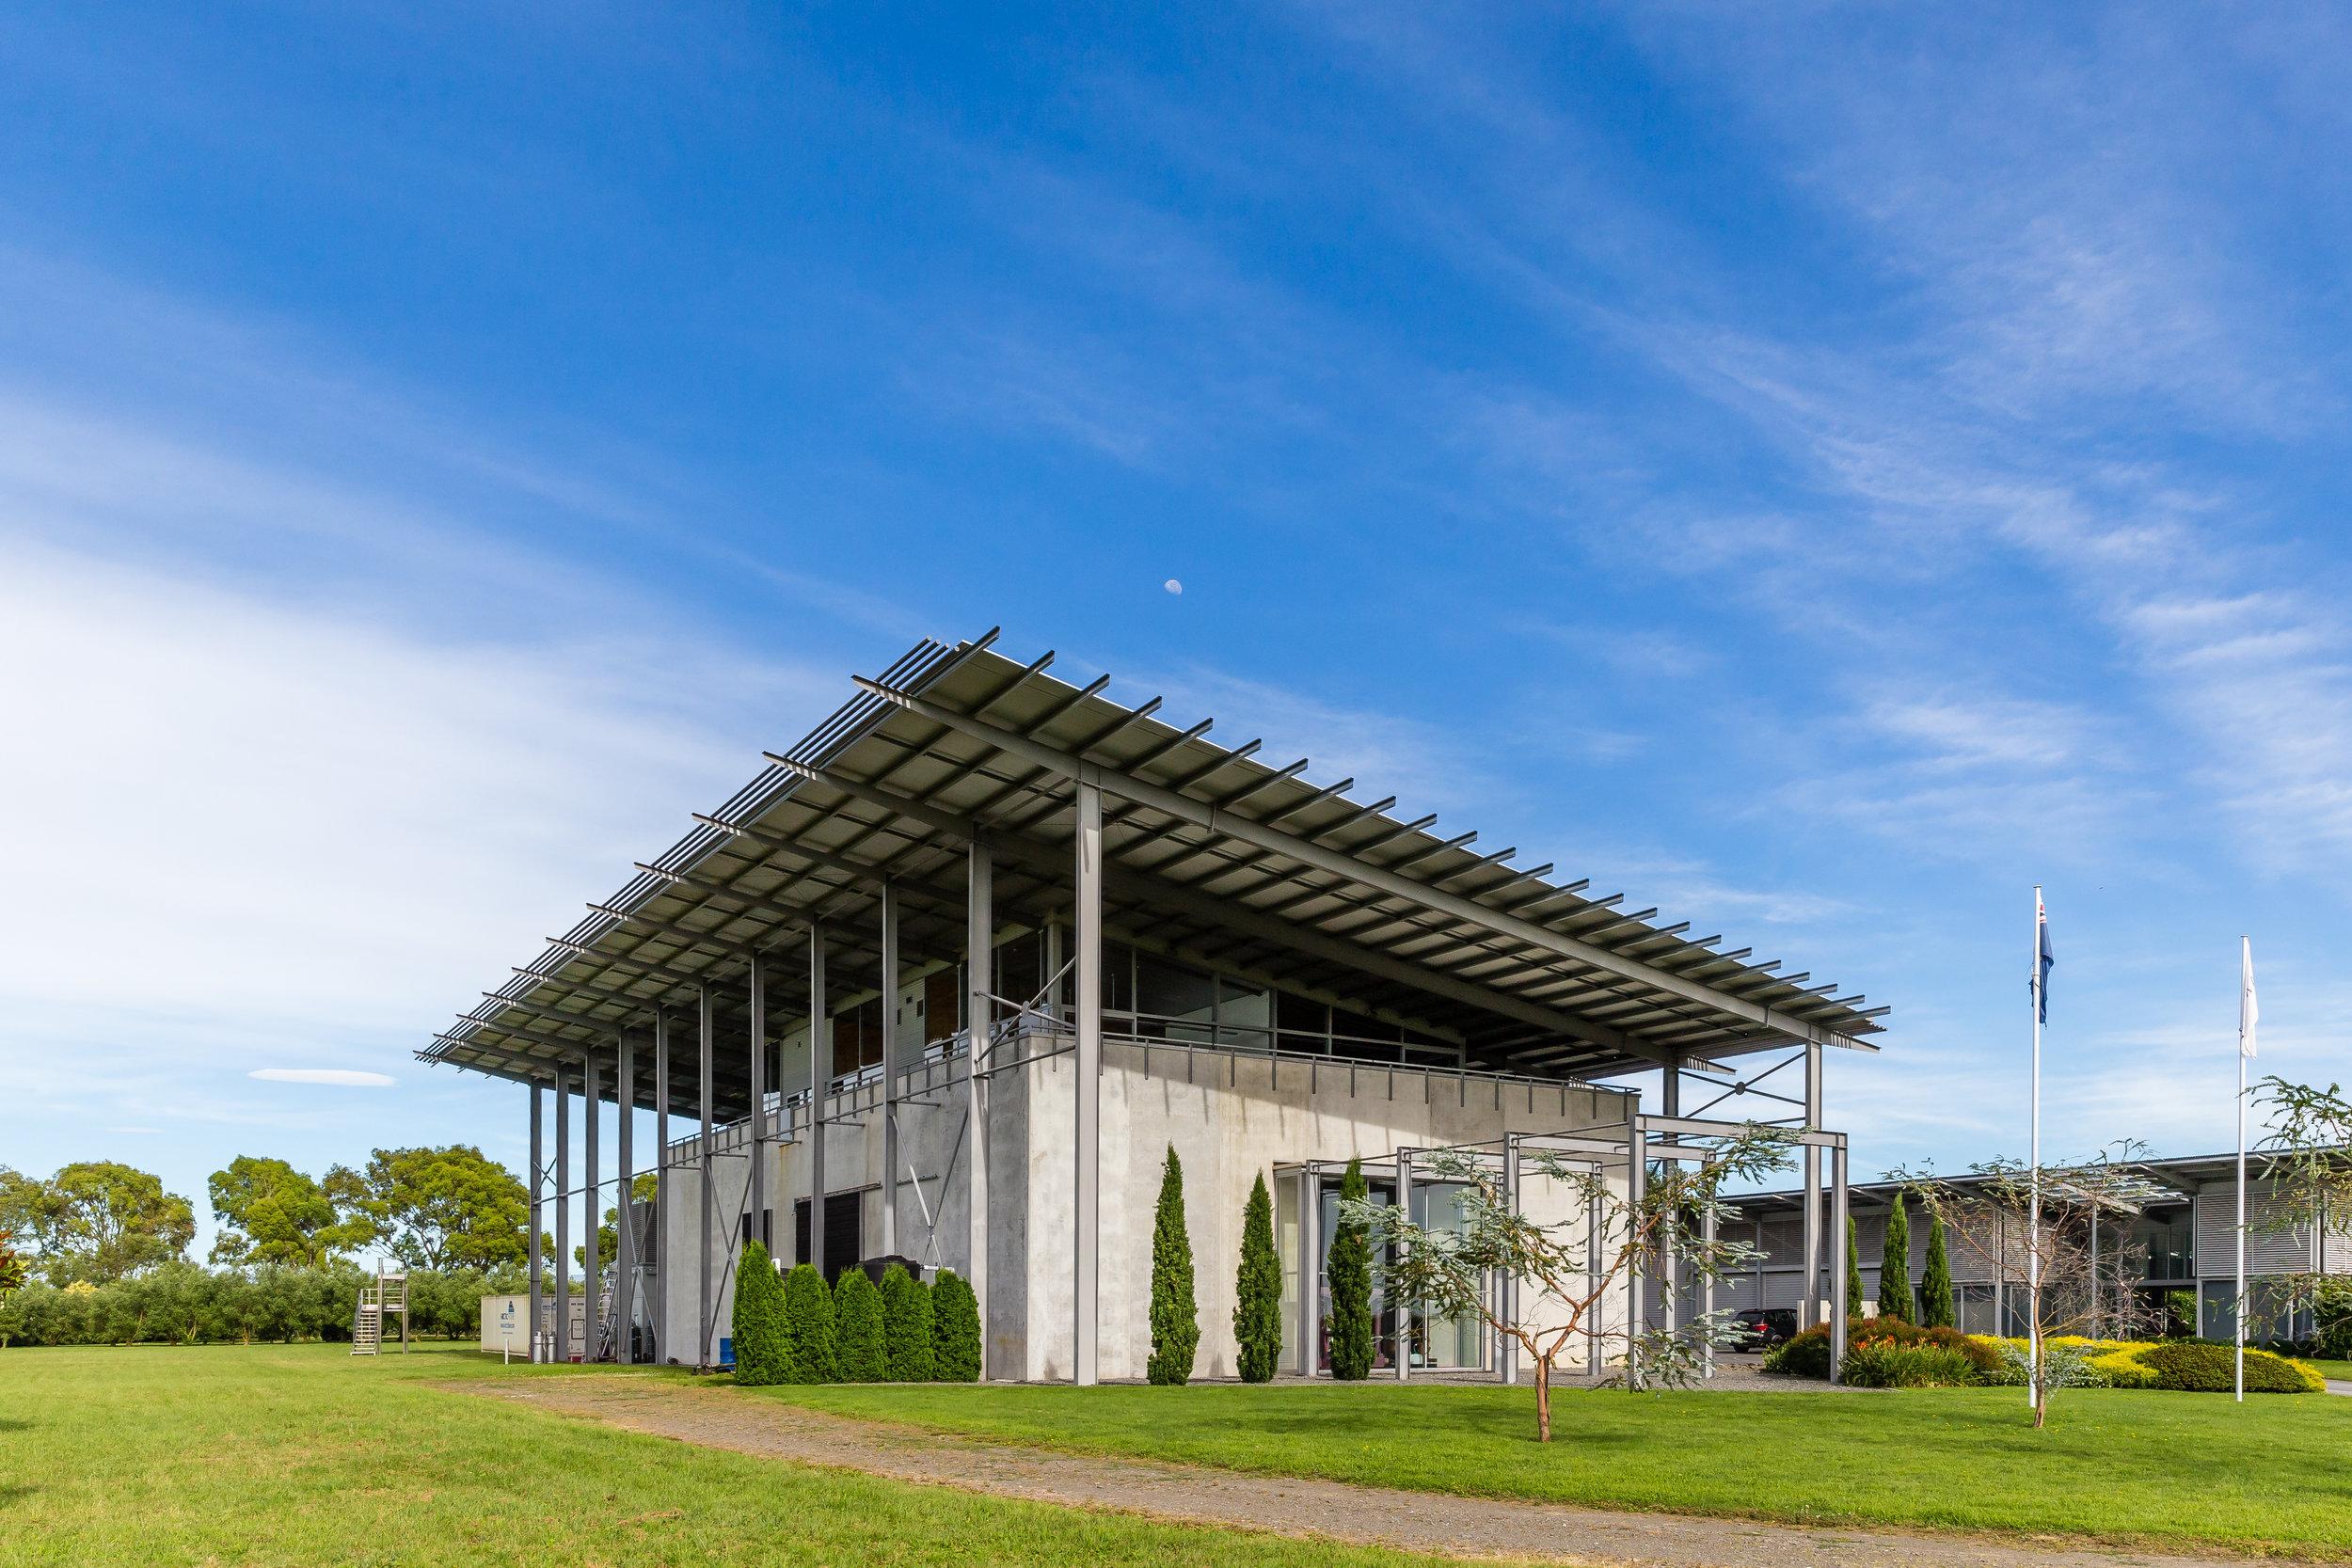 The barrel hall and executive offices at Paritua Vineyard